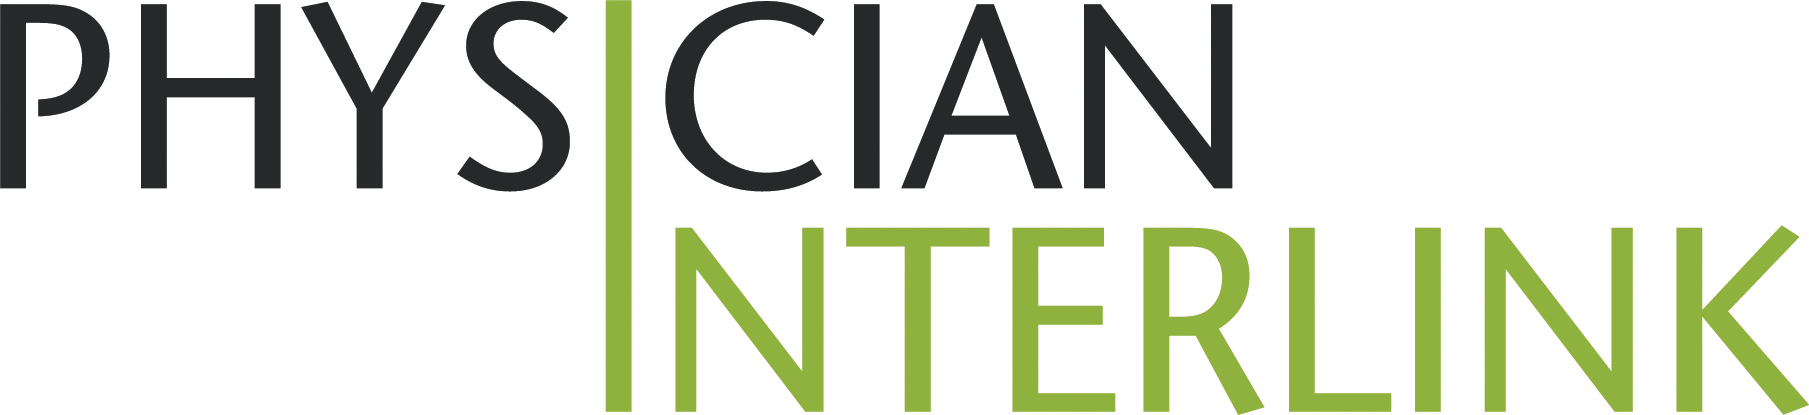 Physician Interlink, LLC